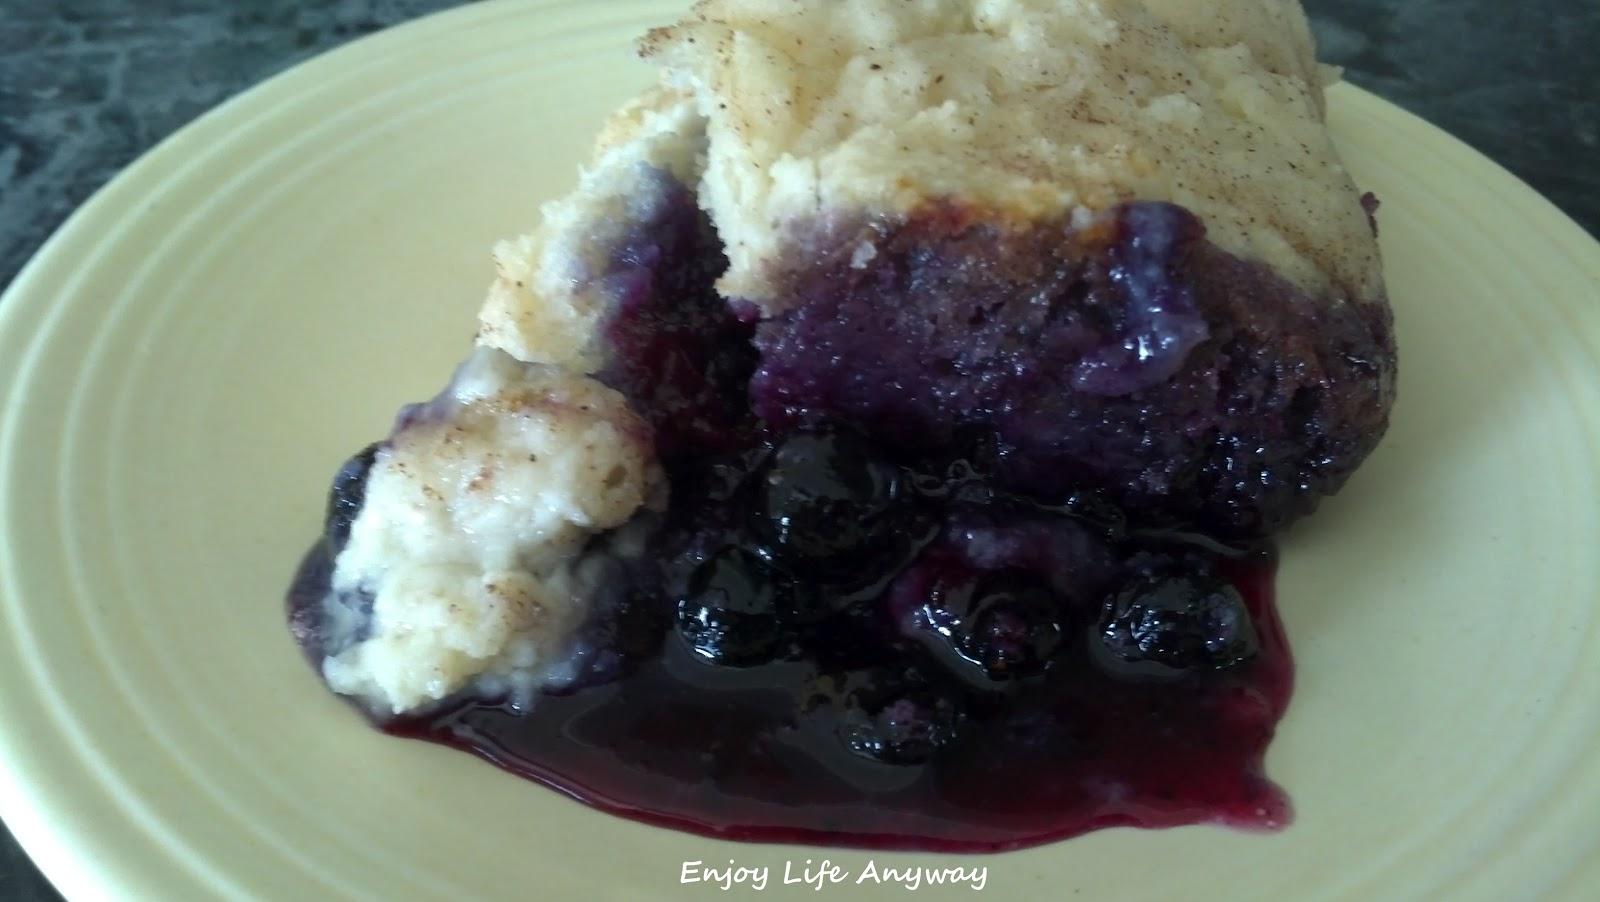 Enjoy Life Anyway: Very Best Blueberry Cobbler